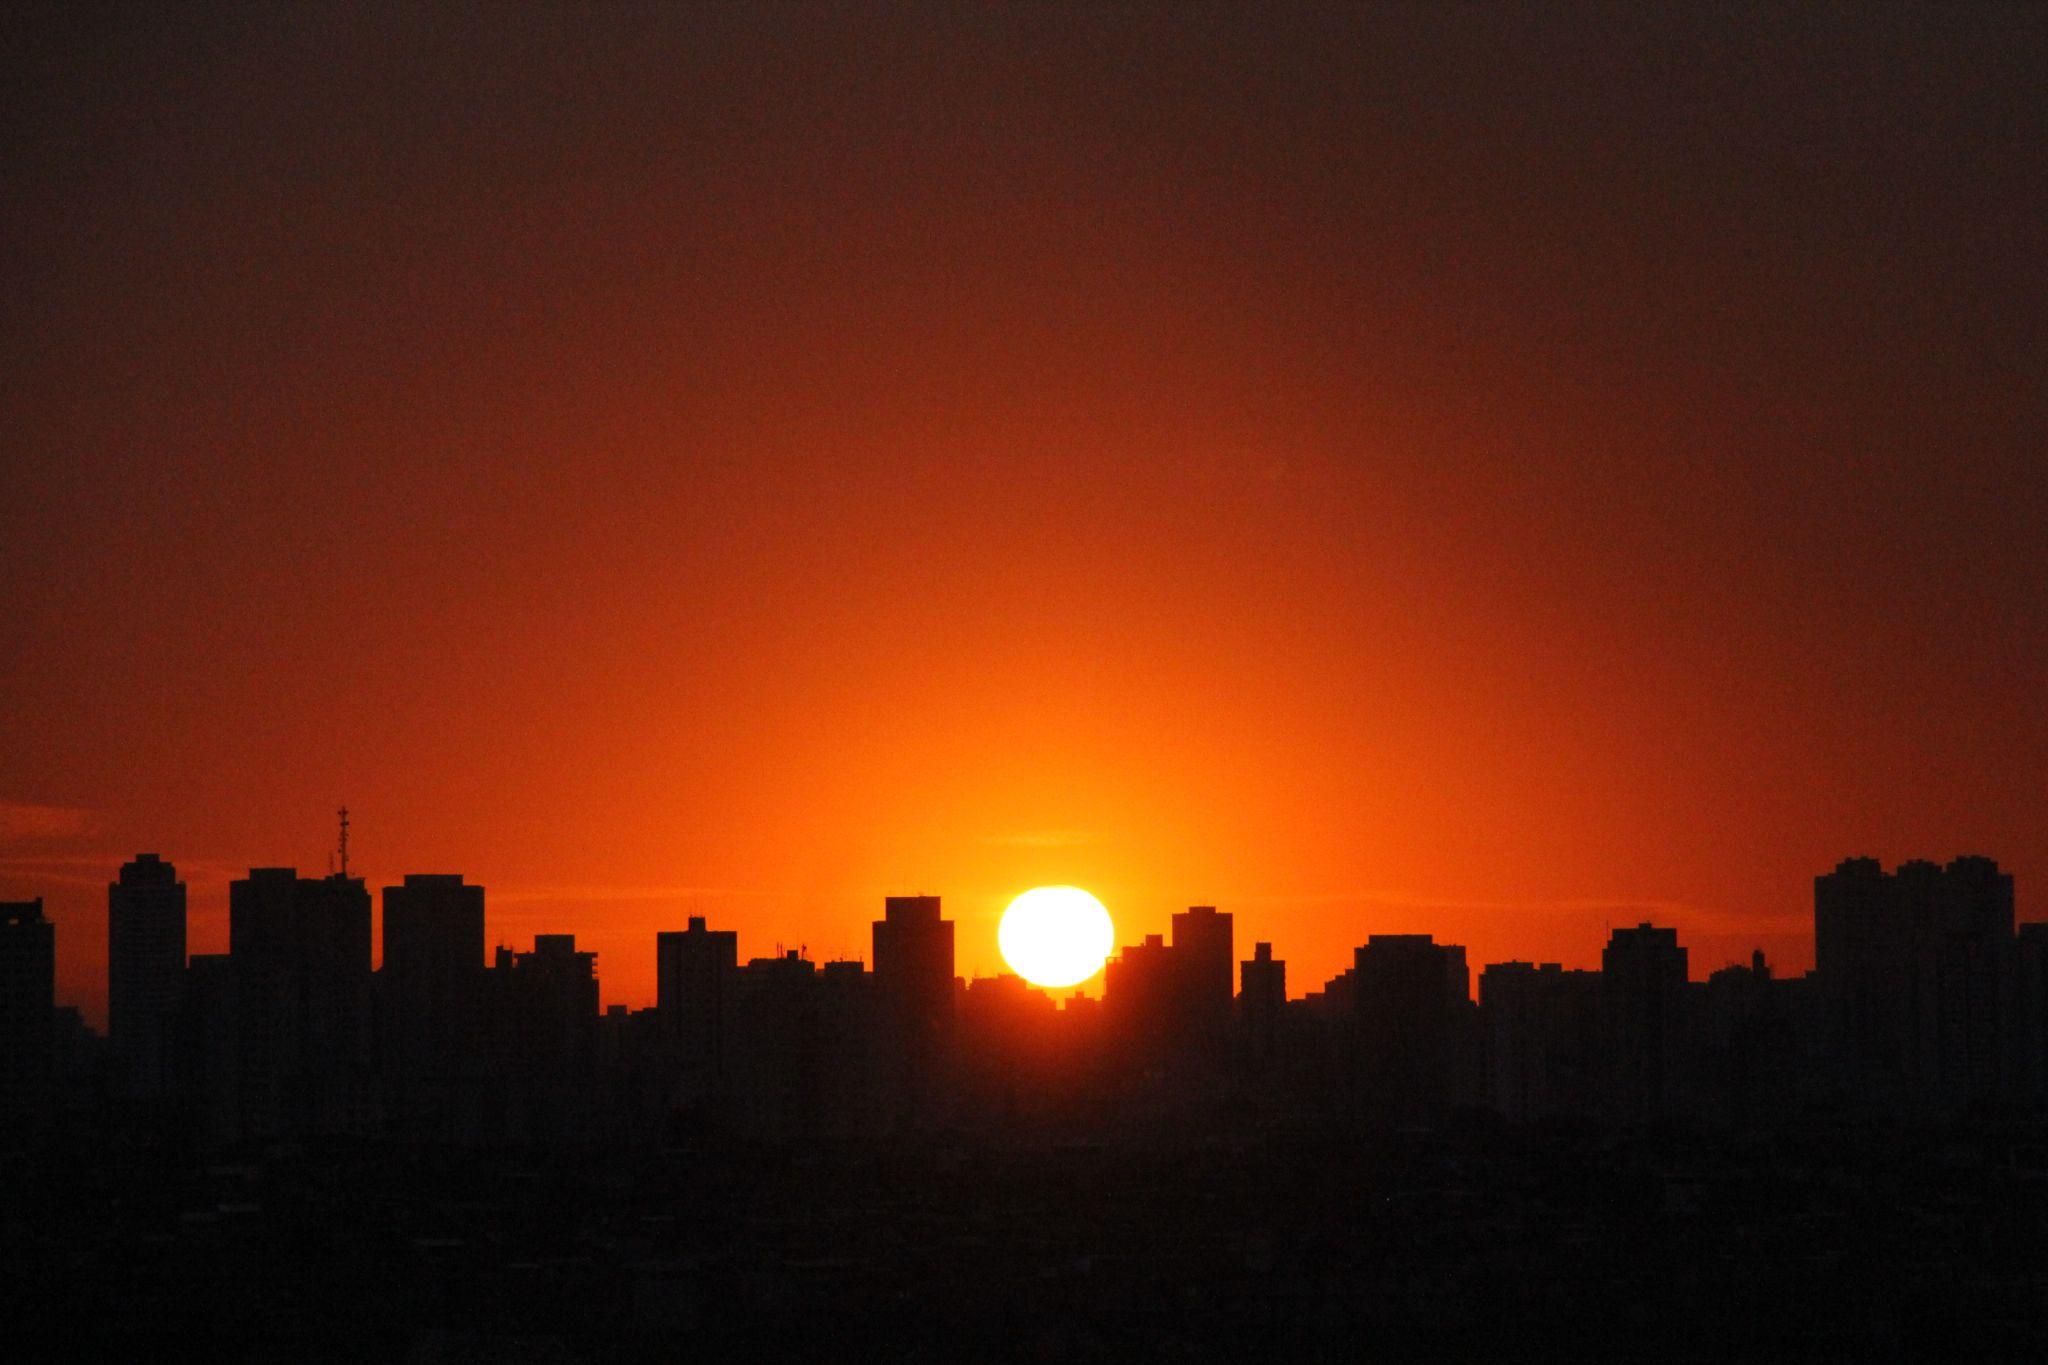 Sunset by Danilo Almeida